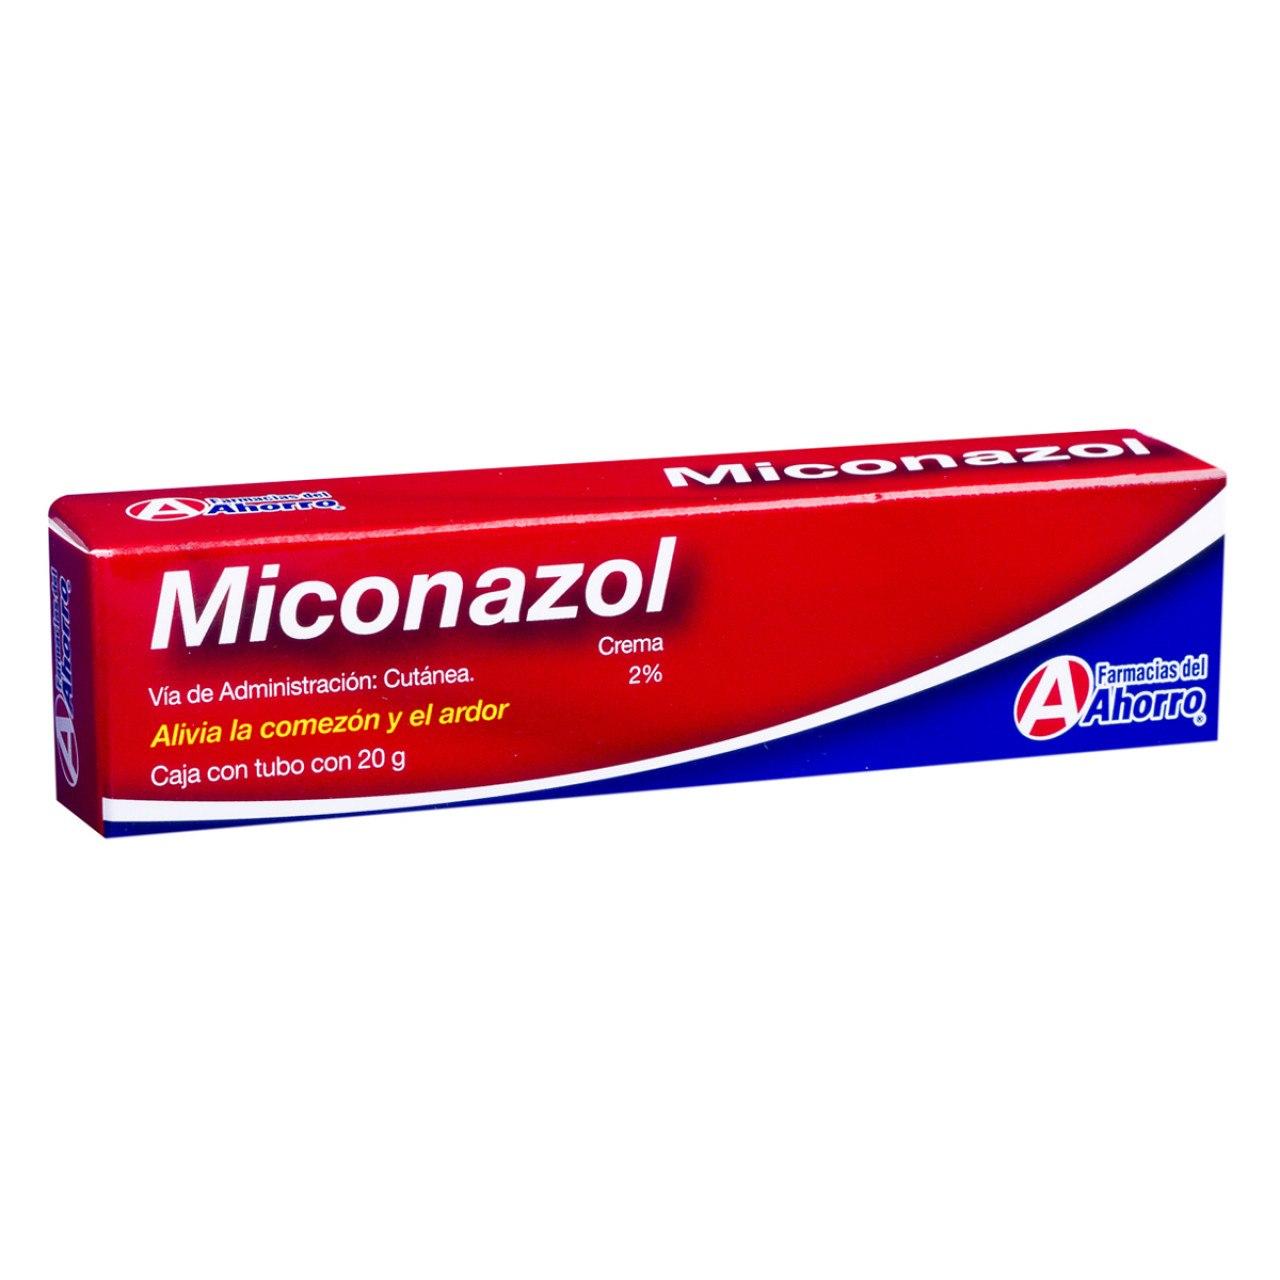 Crema Miconazol 191 Para Qu 233 Sirve